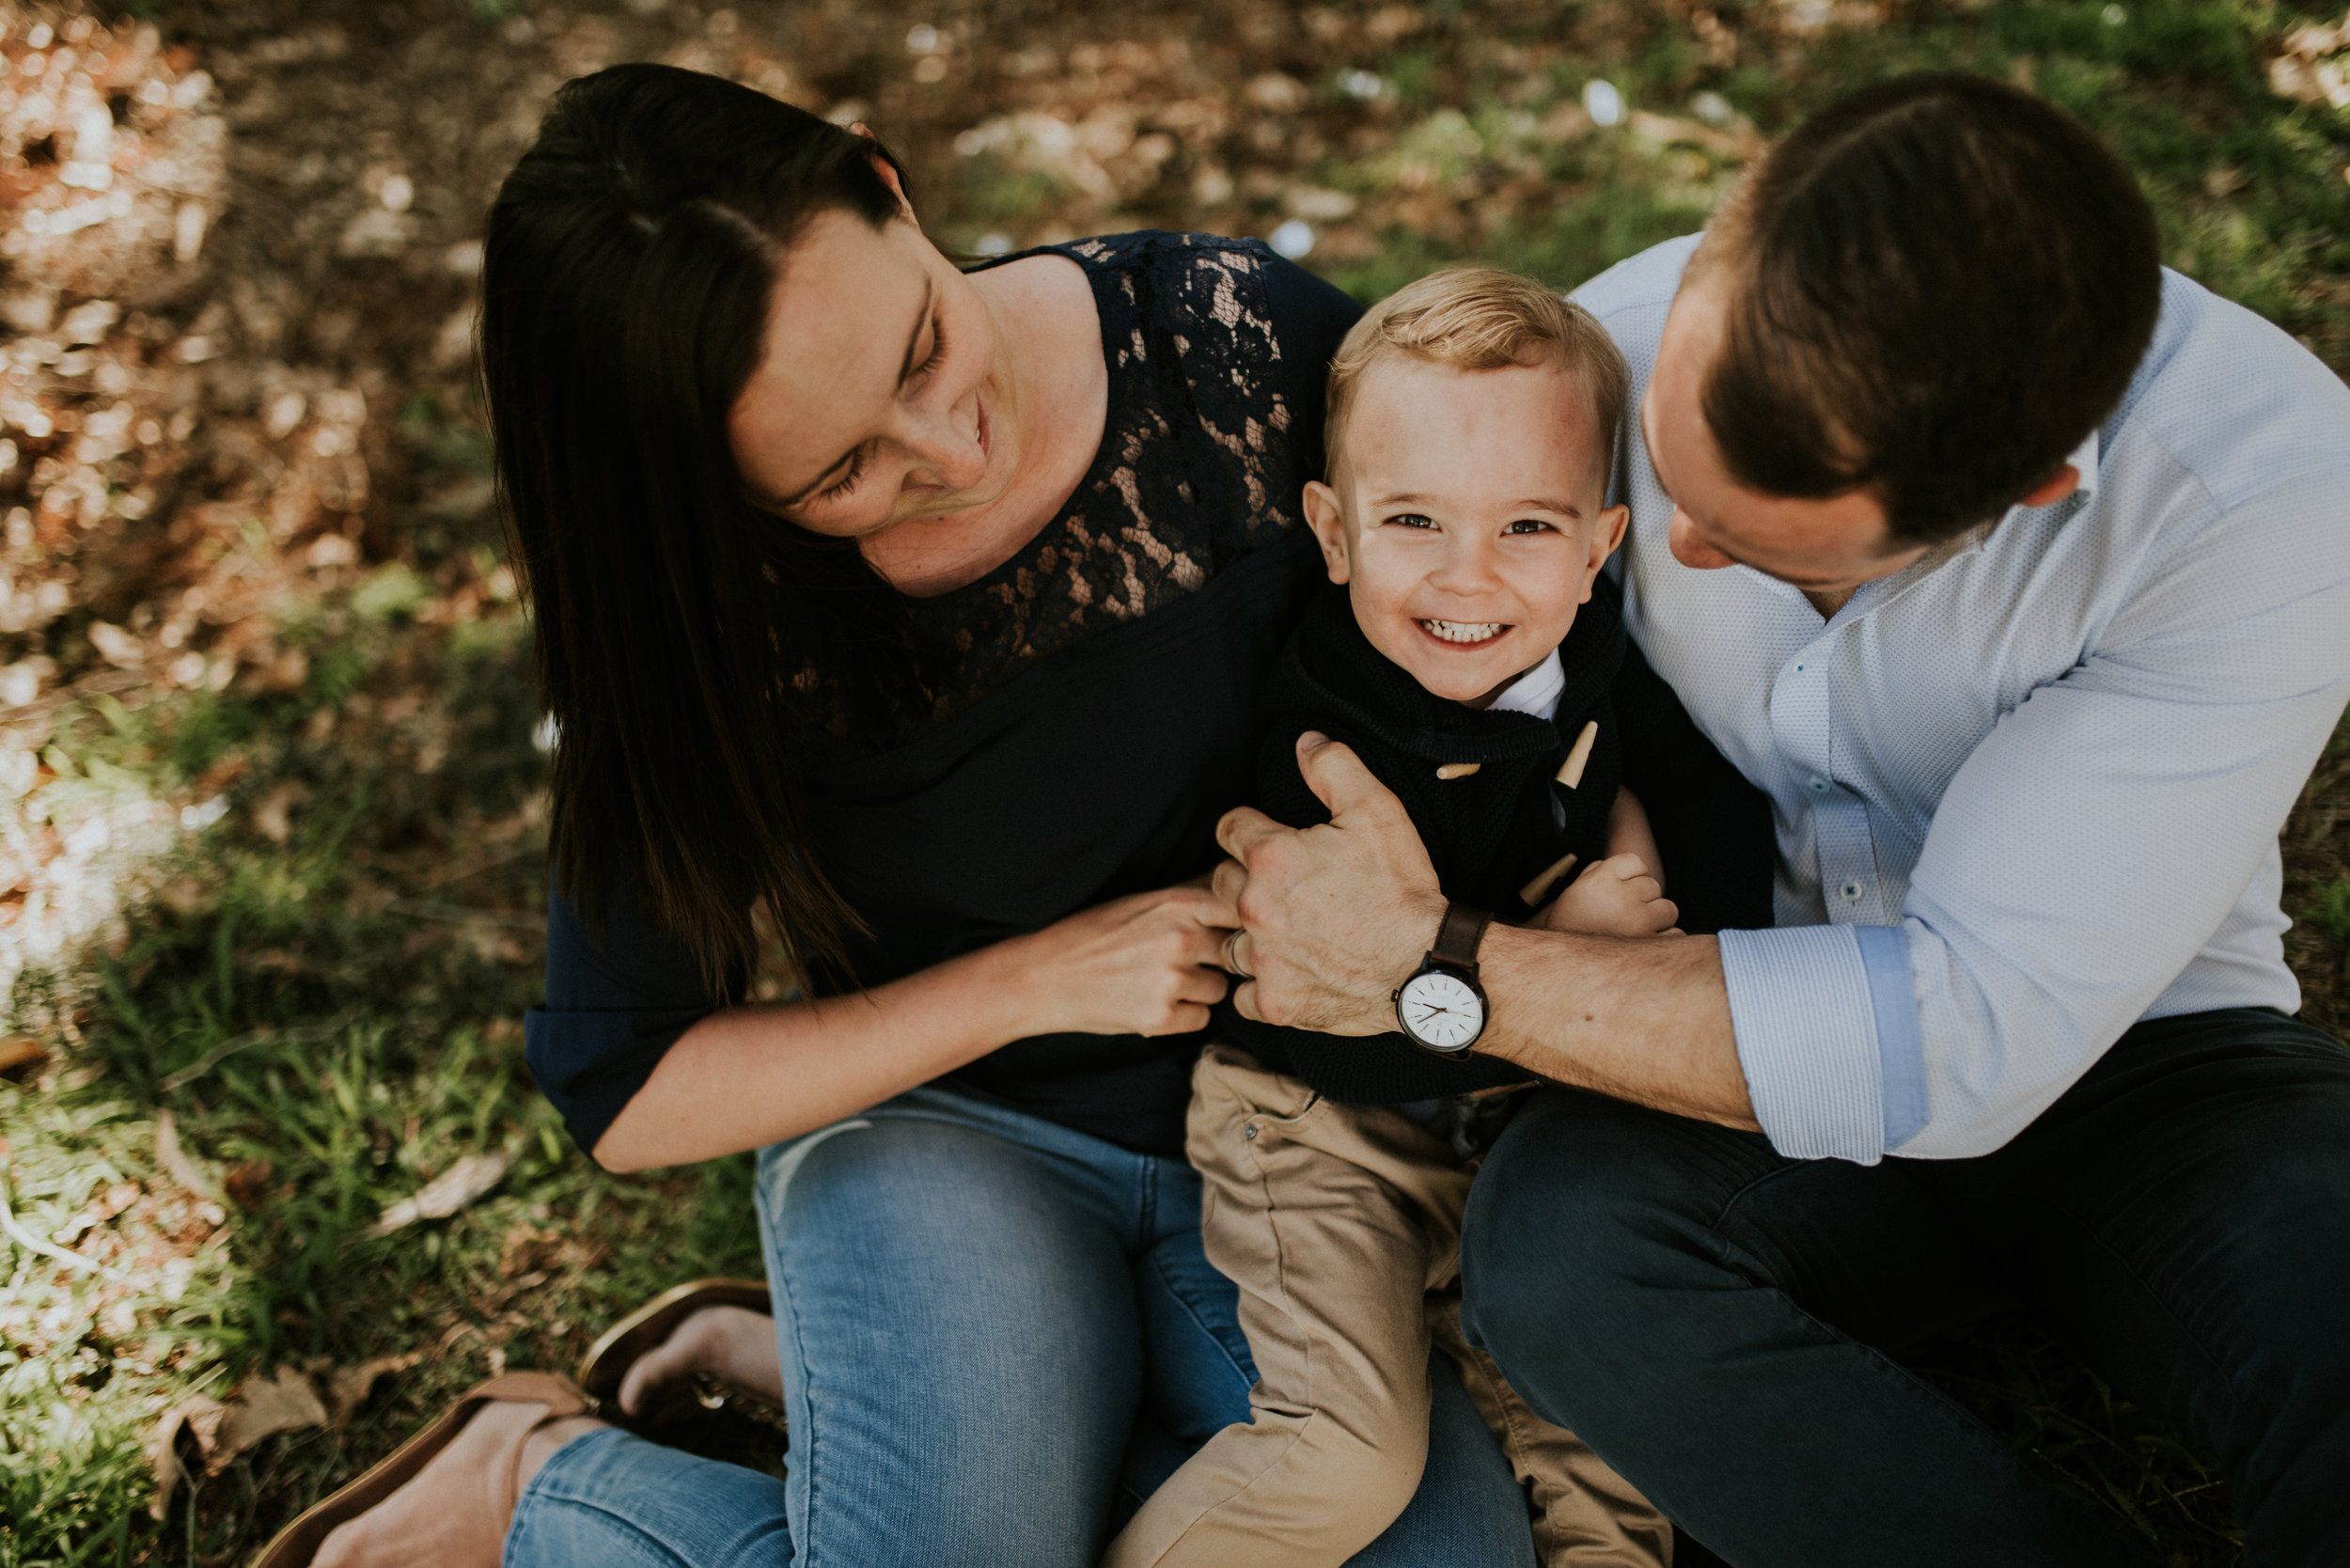 The Ogden Family - Wollongong Family Session    16th September 2018